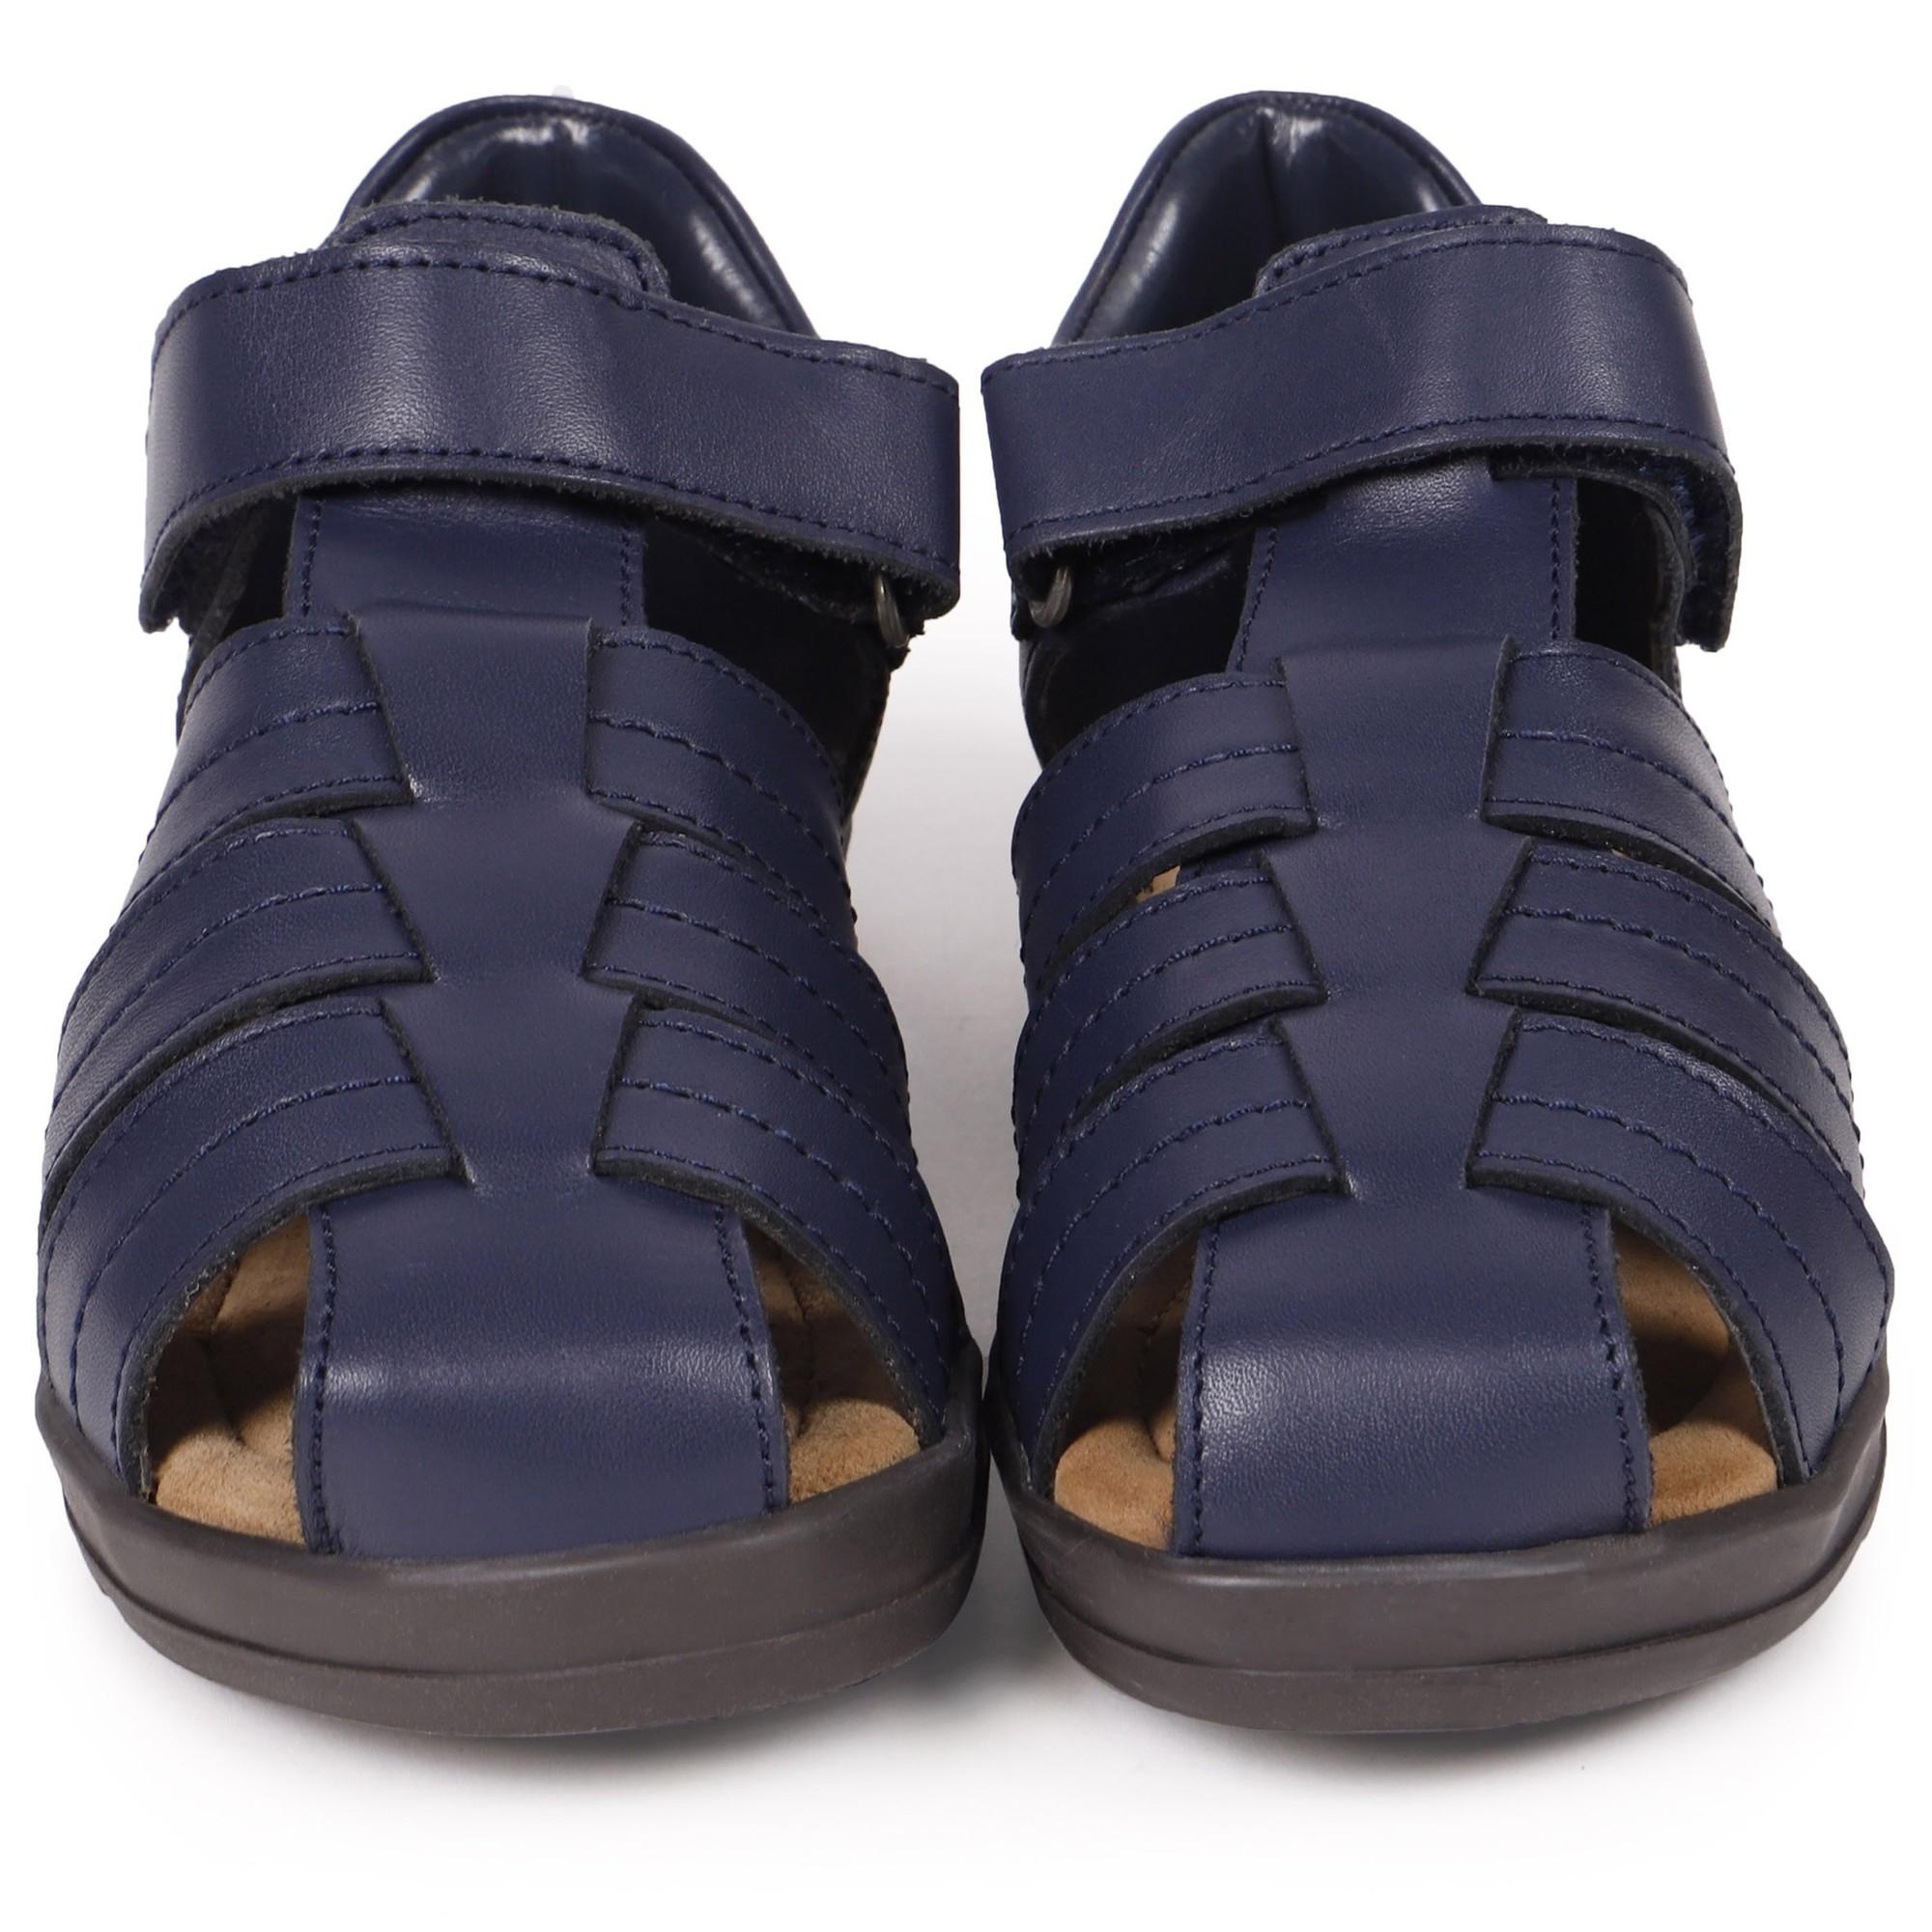 Mens Leather Woven Sandals ~ Mens Dress Sandals